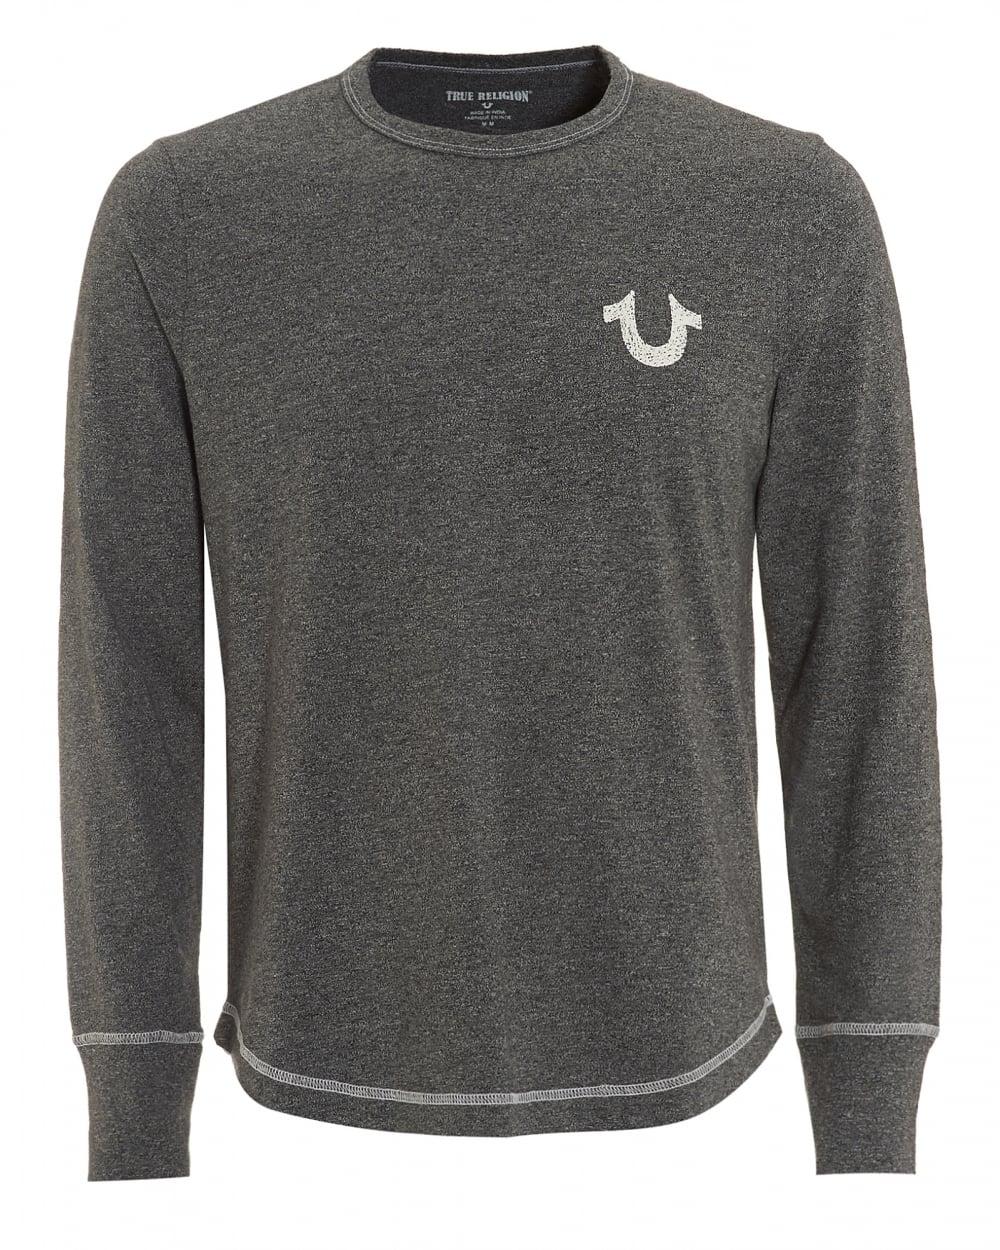 True religion jeans mens horseshoe long sleeved heather Mens heather grey t shirt